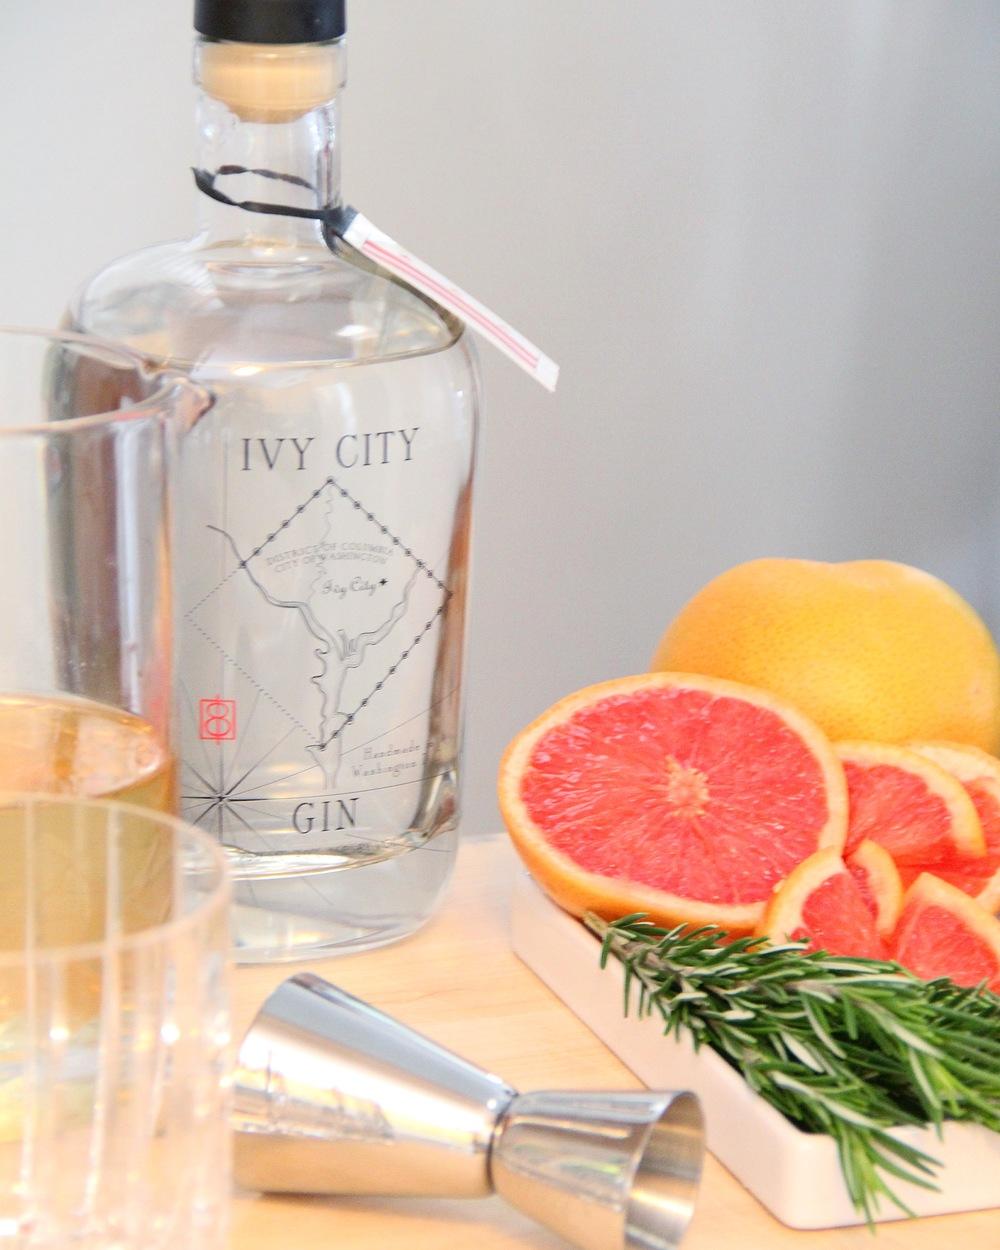 Ivy City Gin.JPG